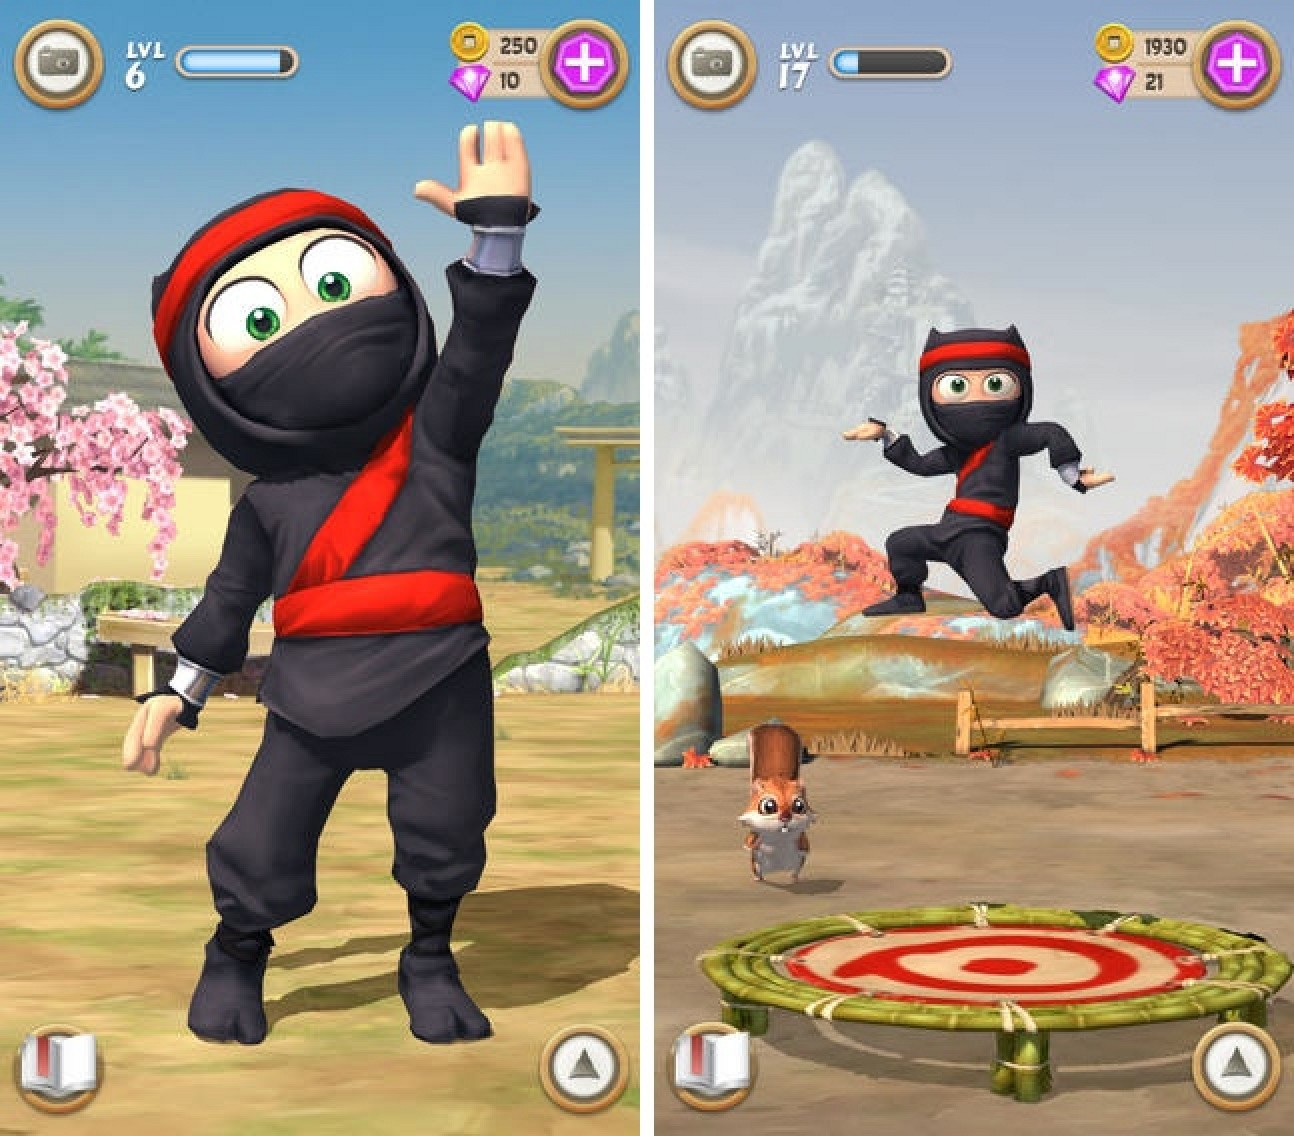 Zynga Acquires Company Behind 'Clumsy Ninja' App - MacRumors